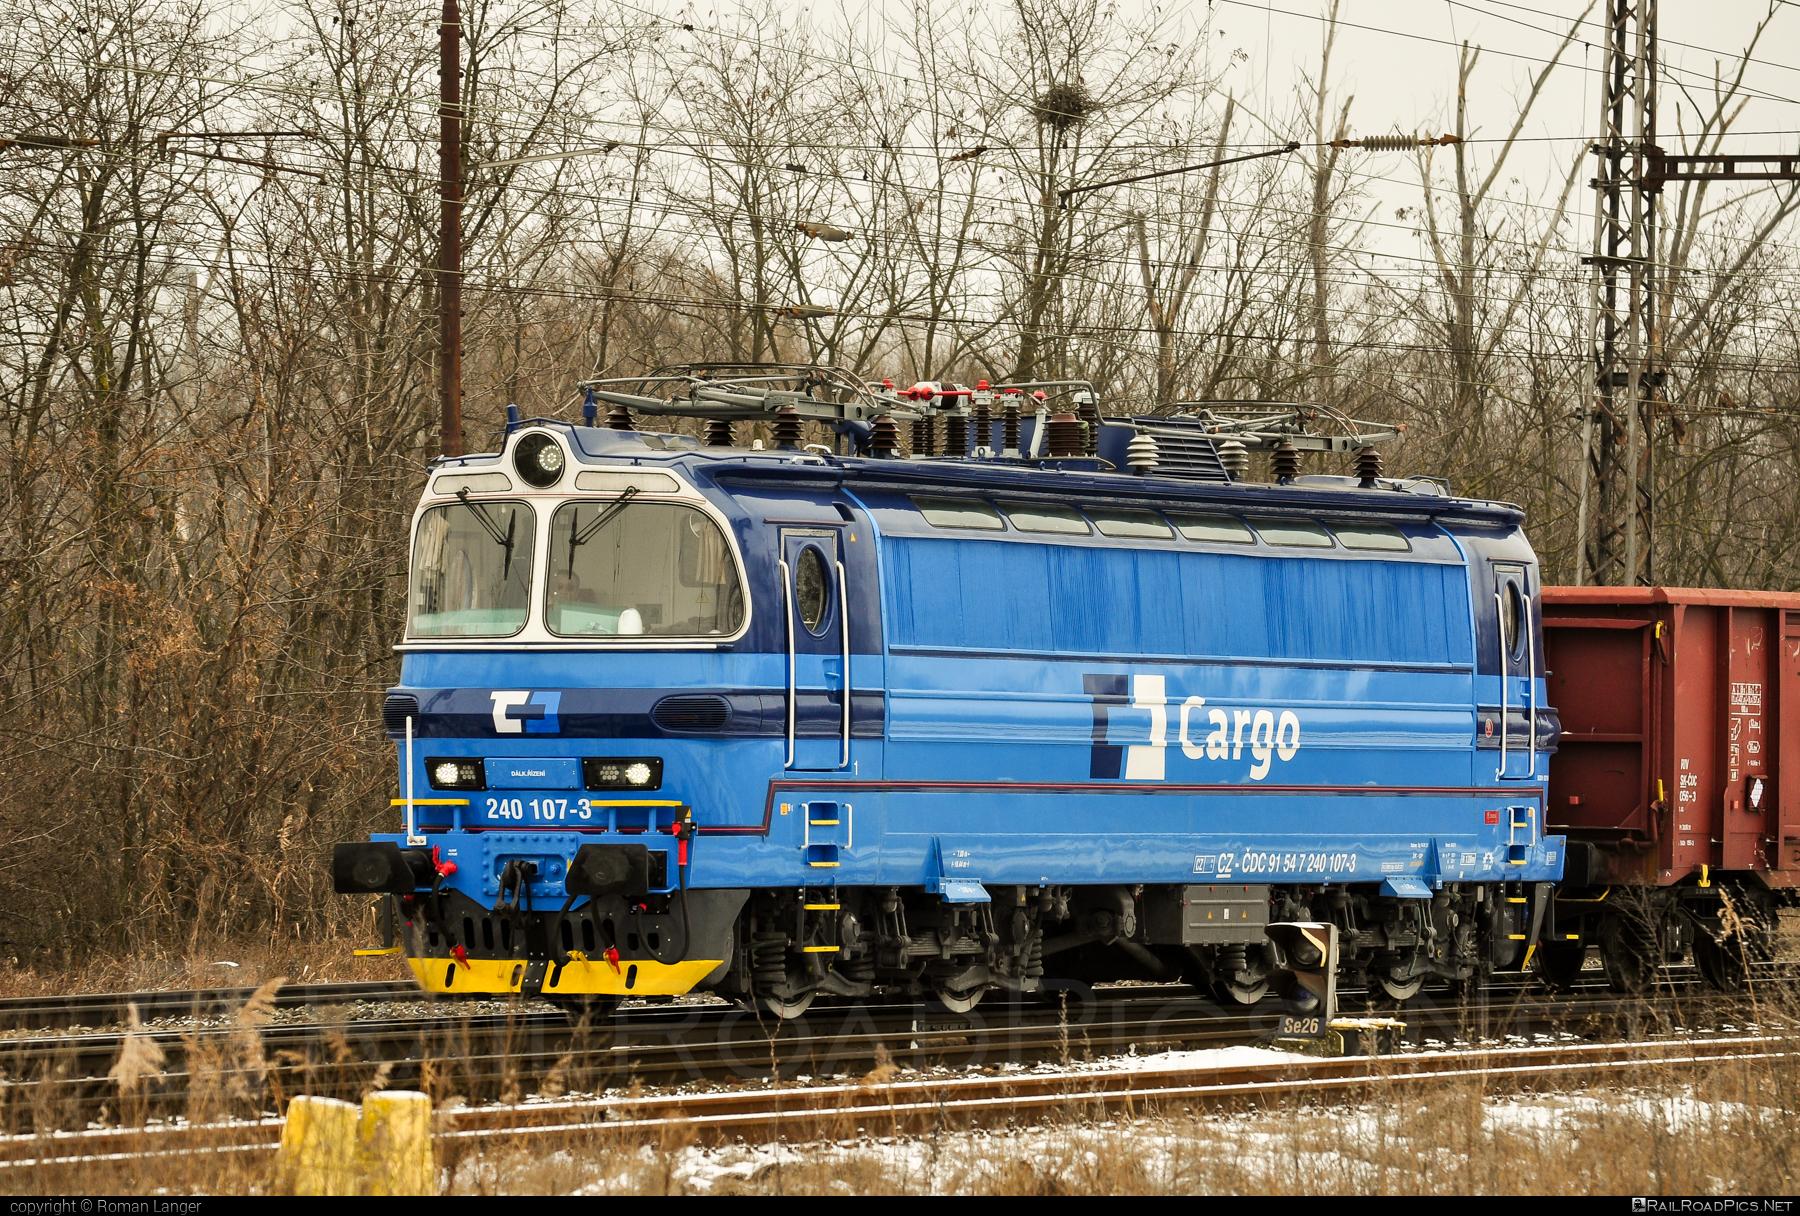 Škoda 47E - 240 107-3 operated by ČD Cargo, a.s. #cdcargo #laminatka #locomotive240 #skoda #skoda47e